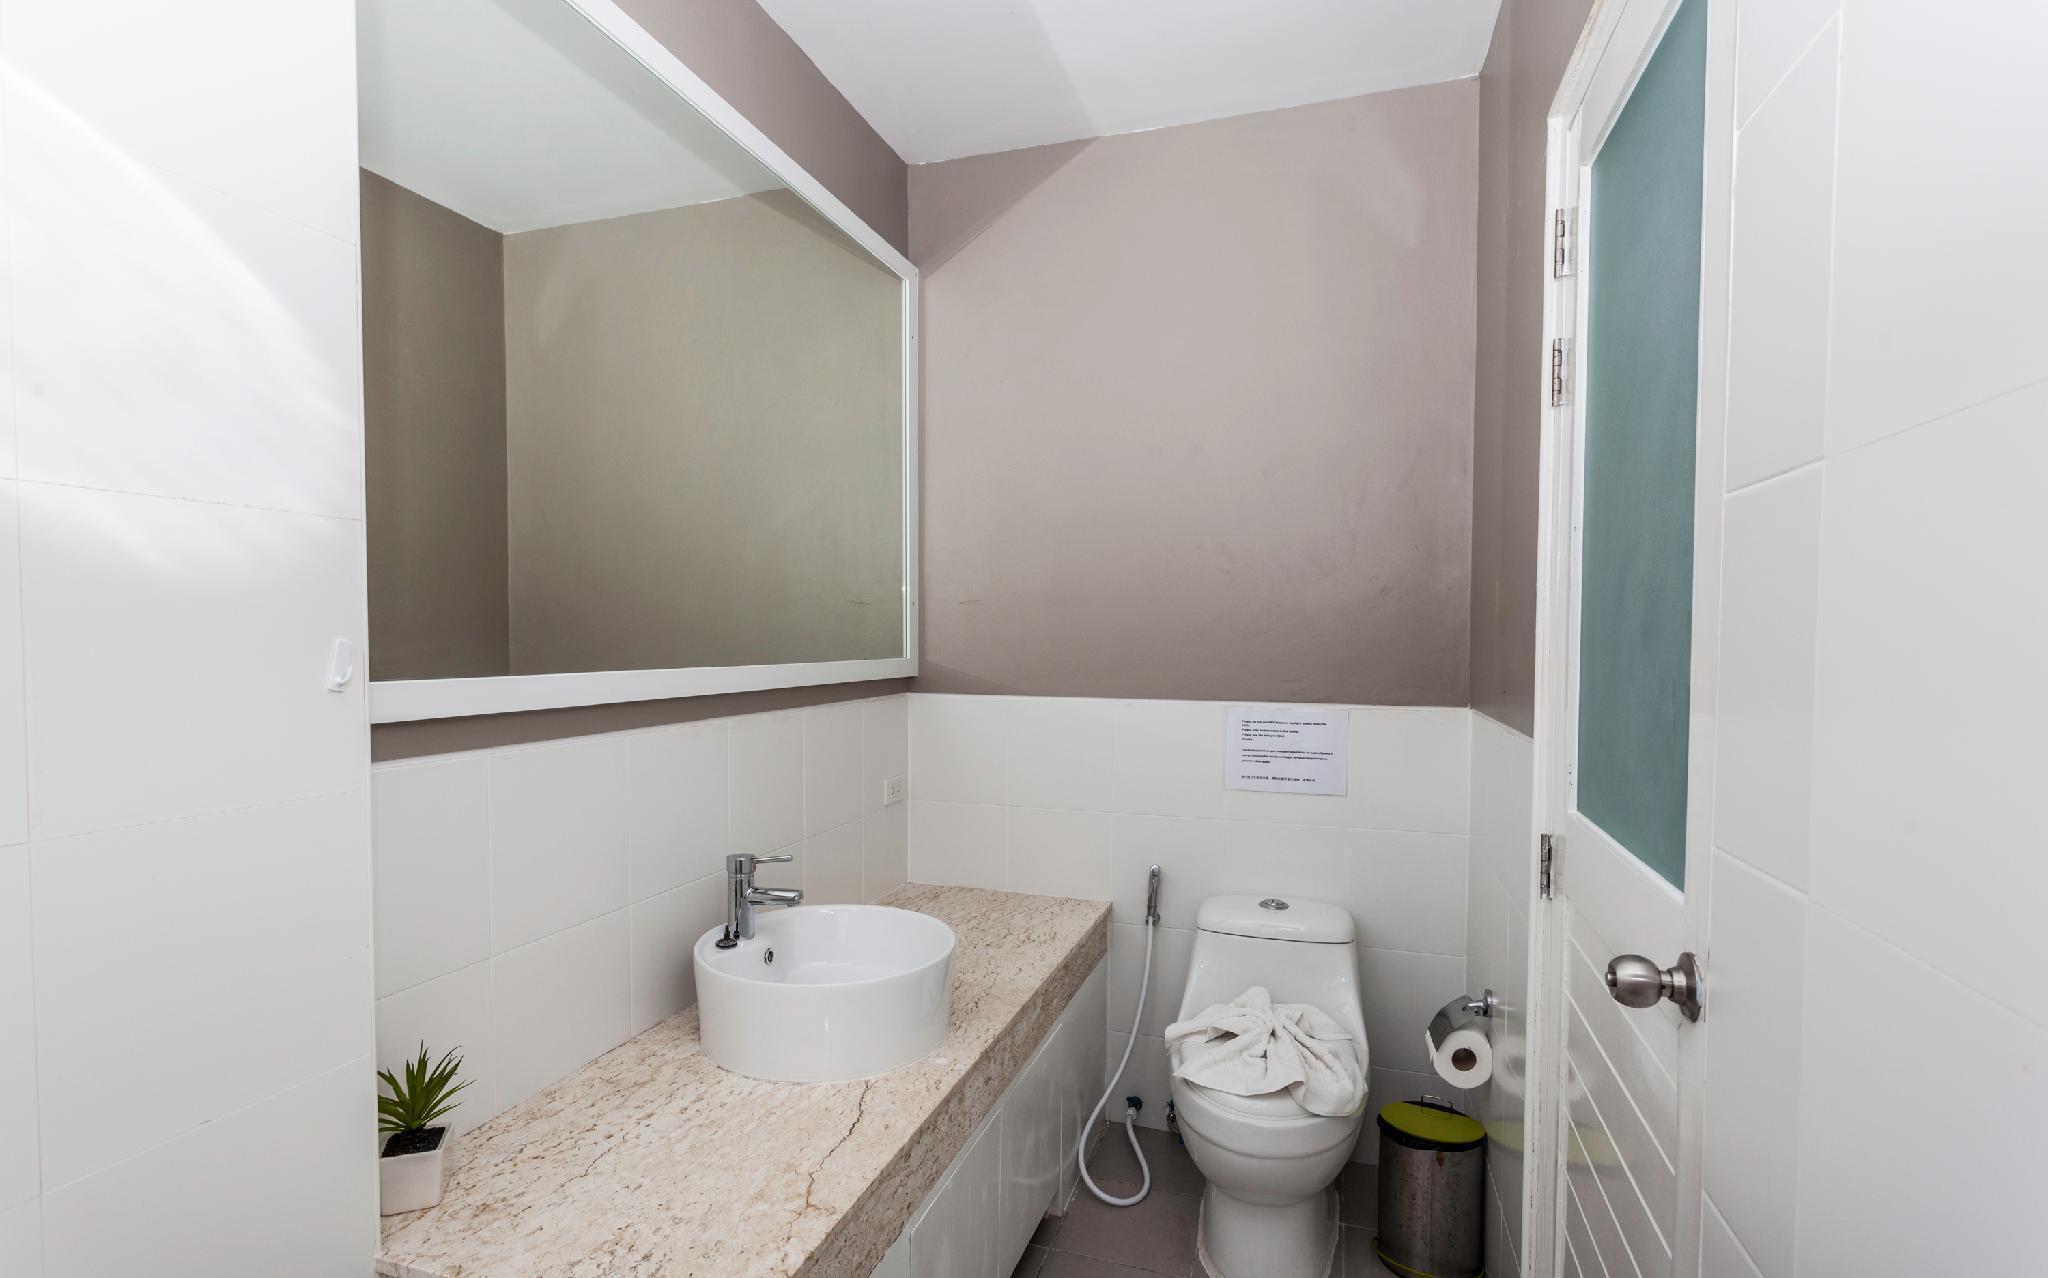 Stunning 3 bedrooms villa near the beach วิลลา 3 ห้องนอน 3 ห้องน้ำส่วนตัว ขนาด 150 ตร.ม. – บางเทา